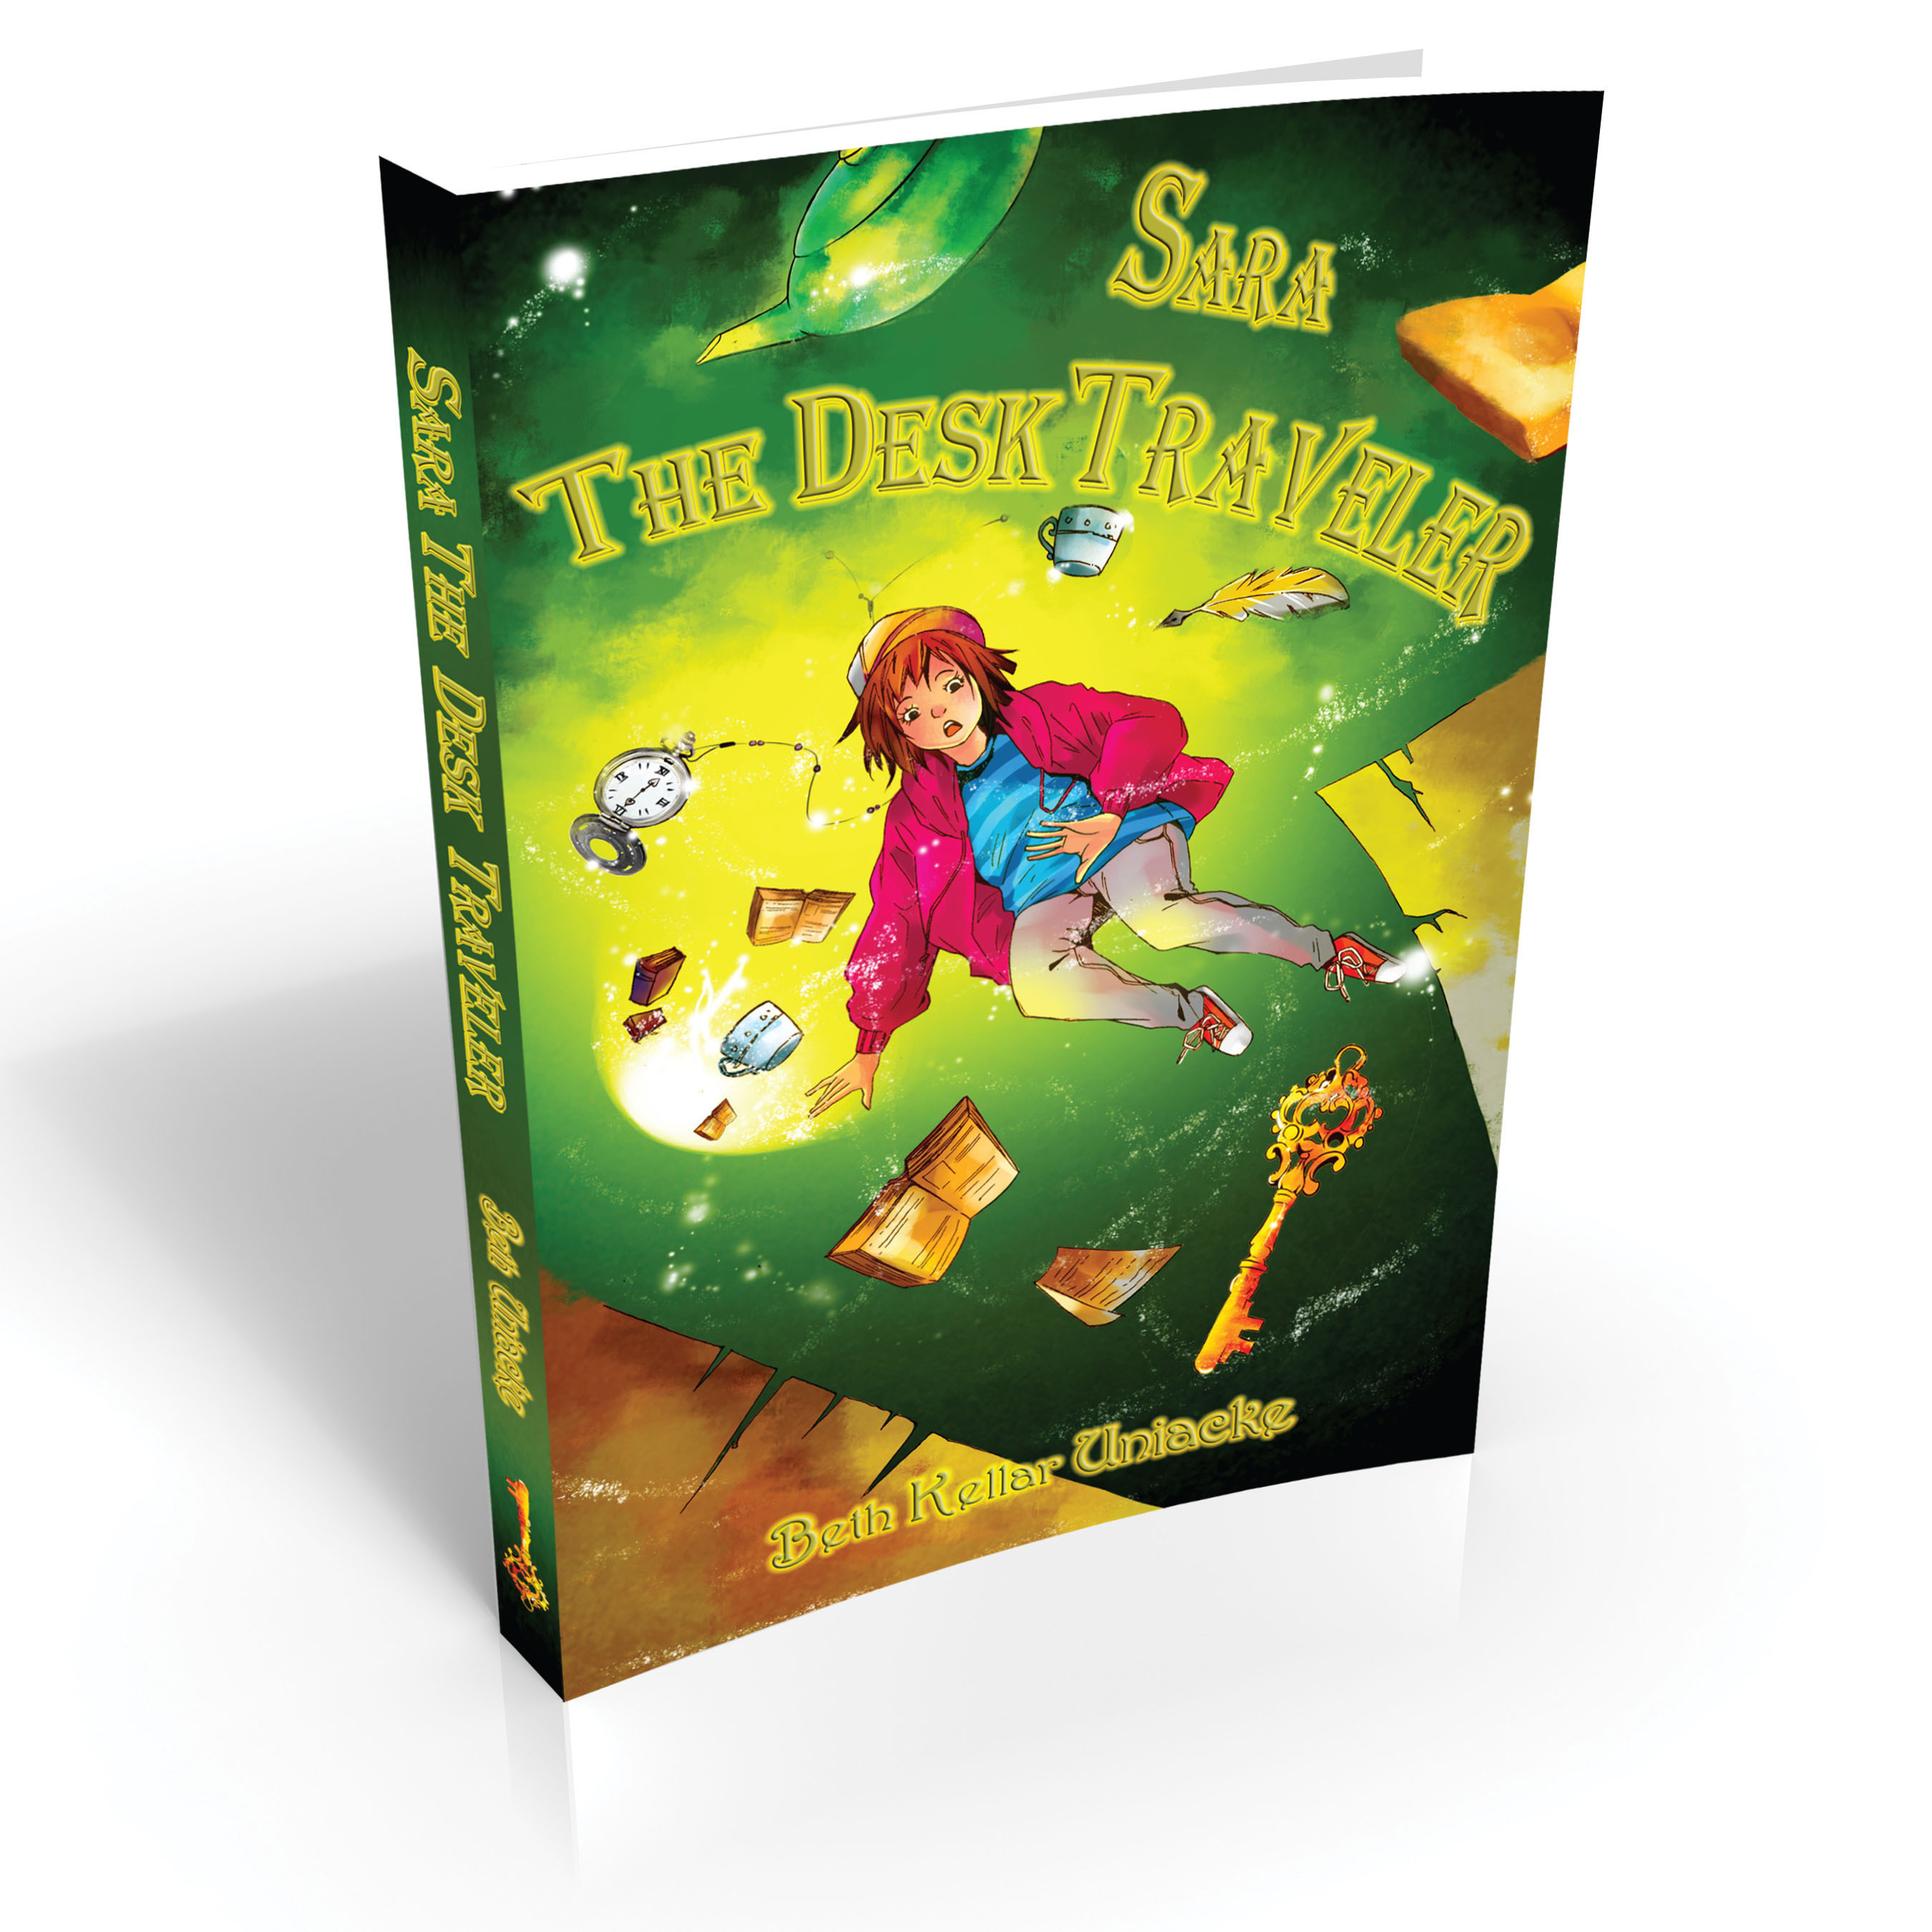 'Sara, The Desk Traveler' is Released